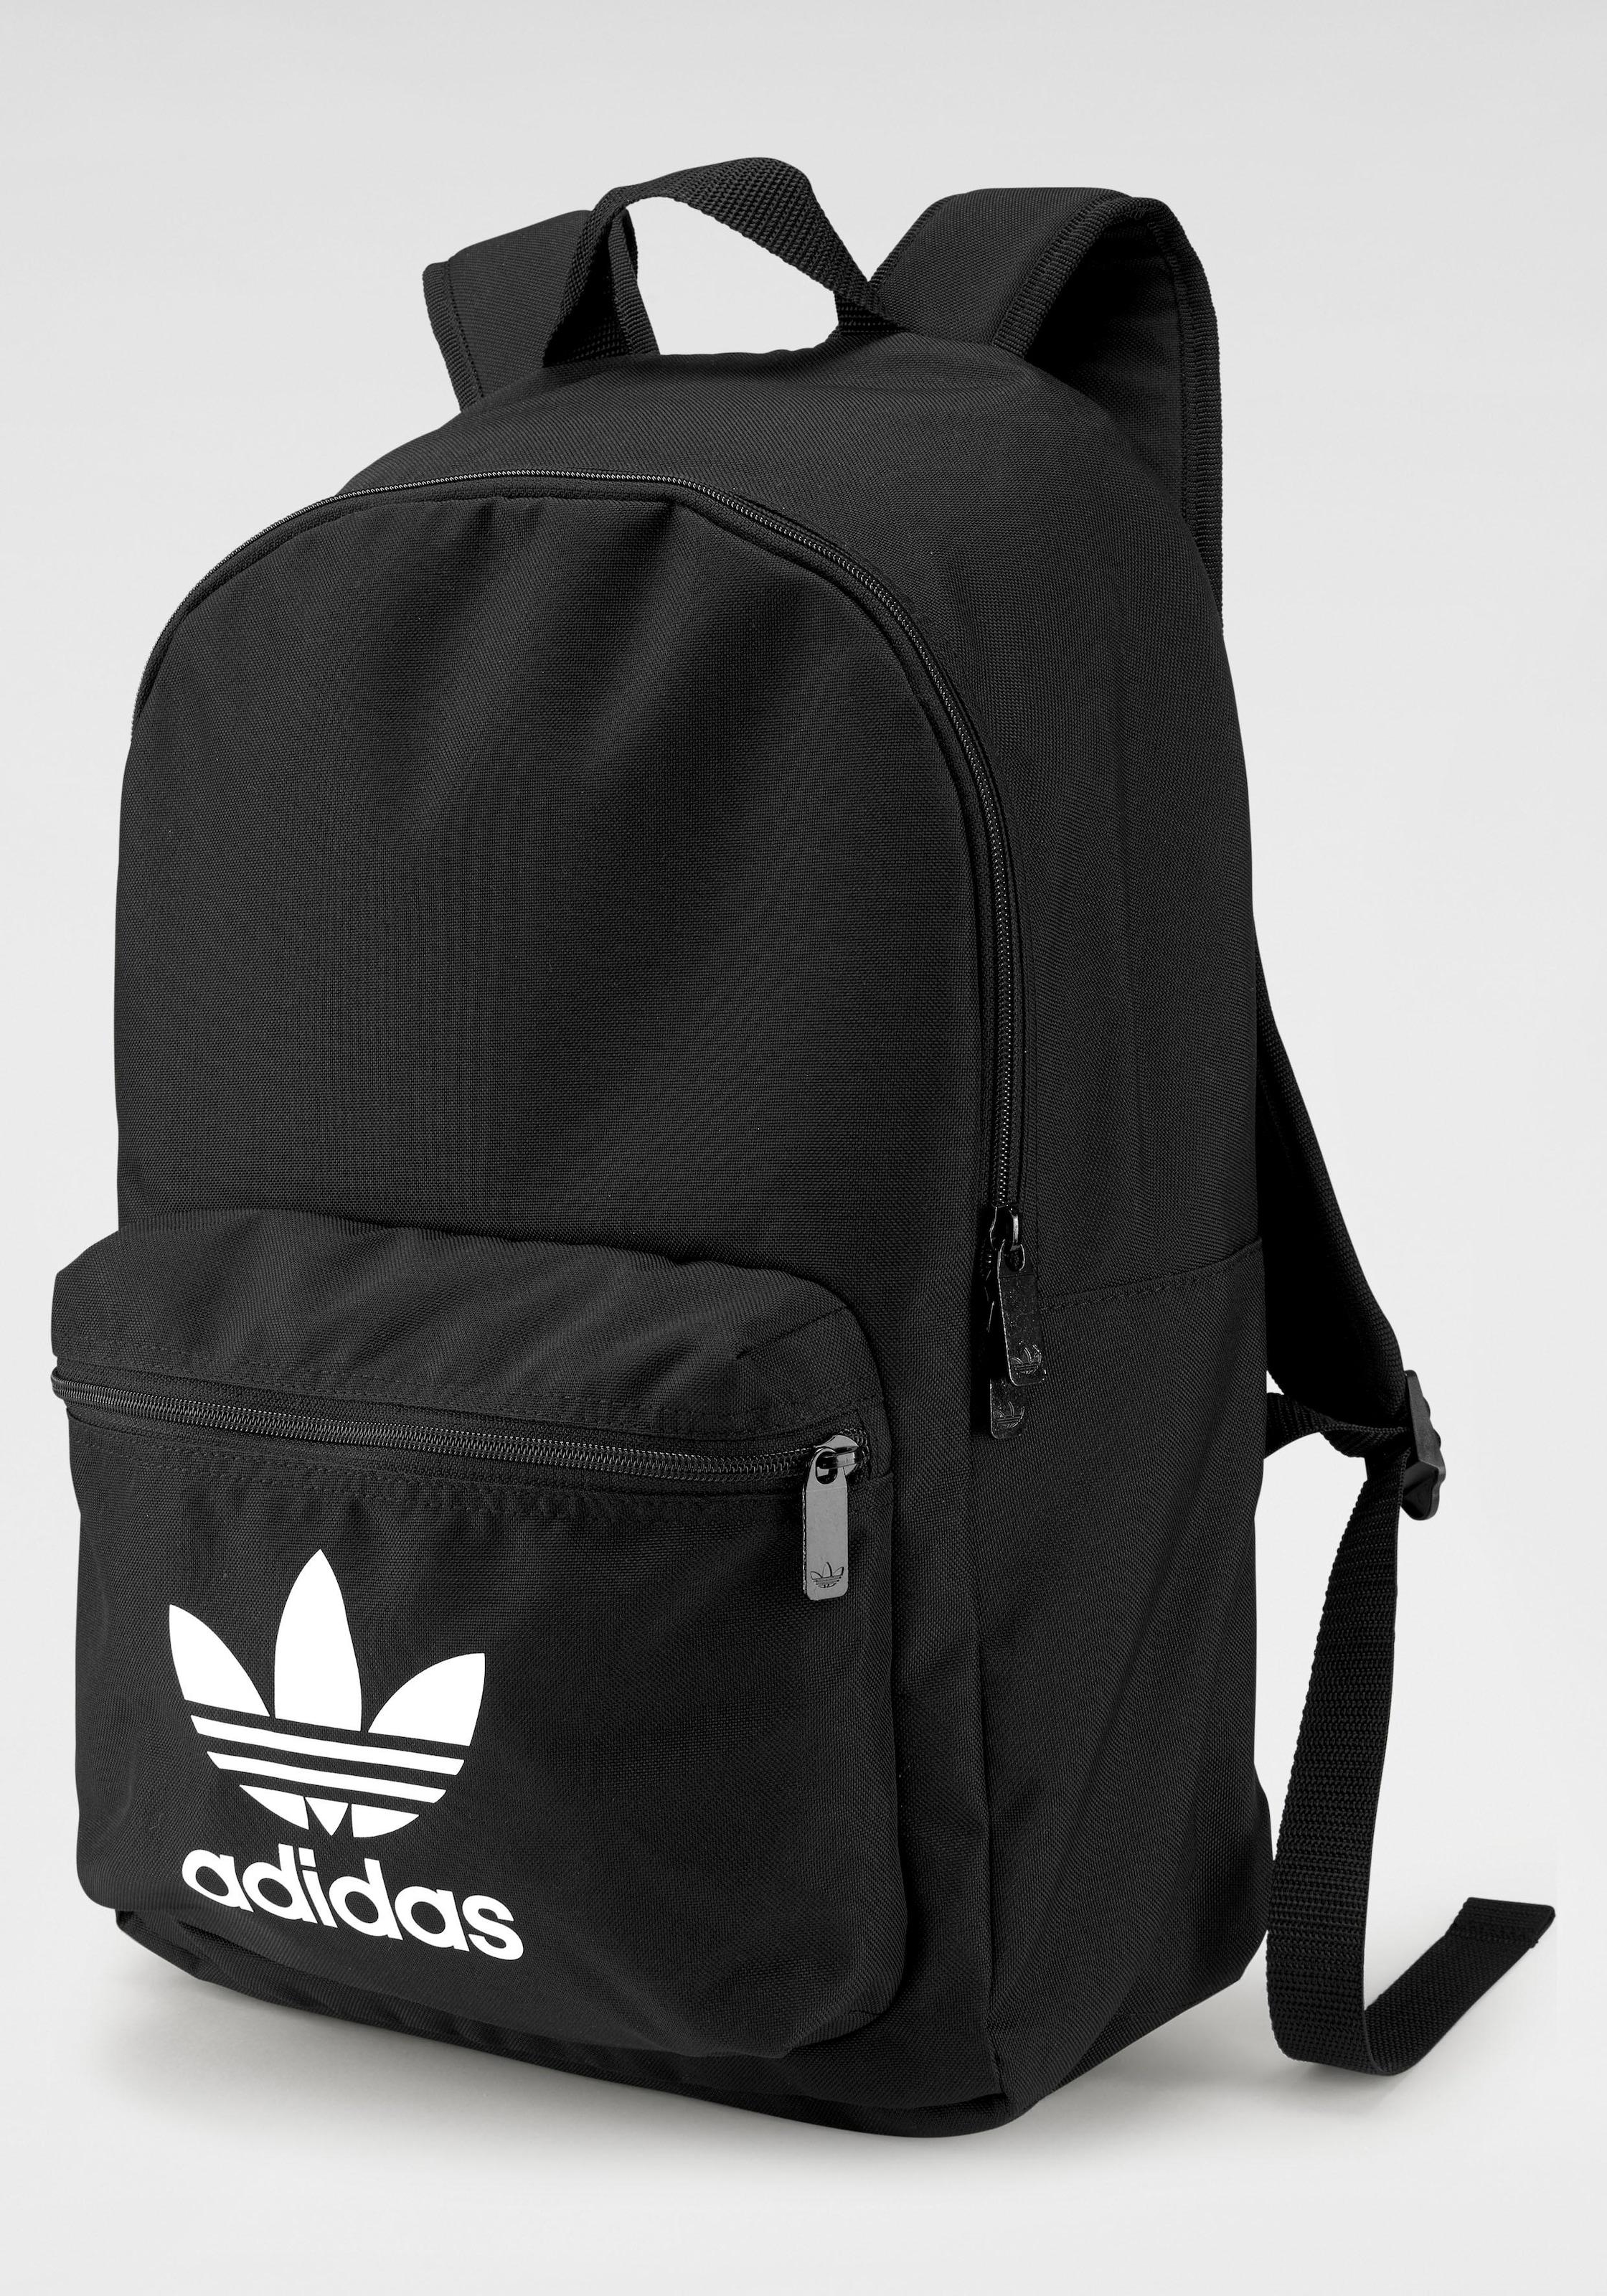 adidas Originals Sportrucksack »AC CLASSIC BACKPACK« online kaufen | BAUR